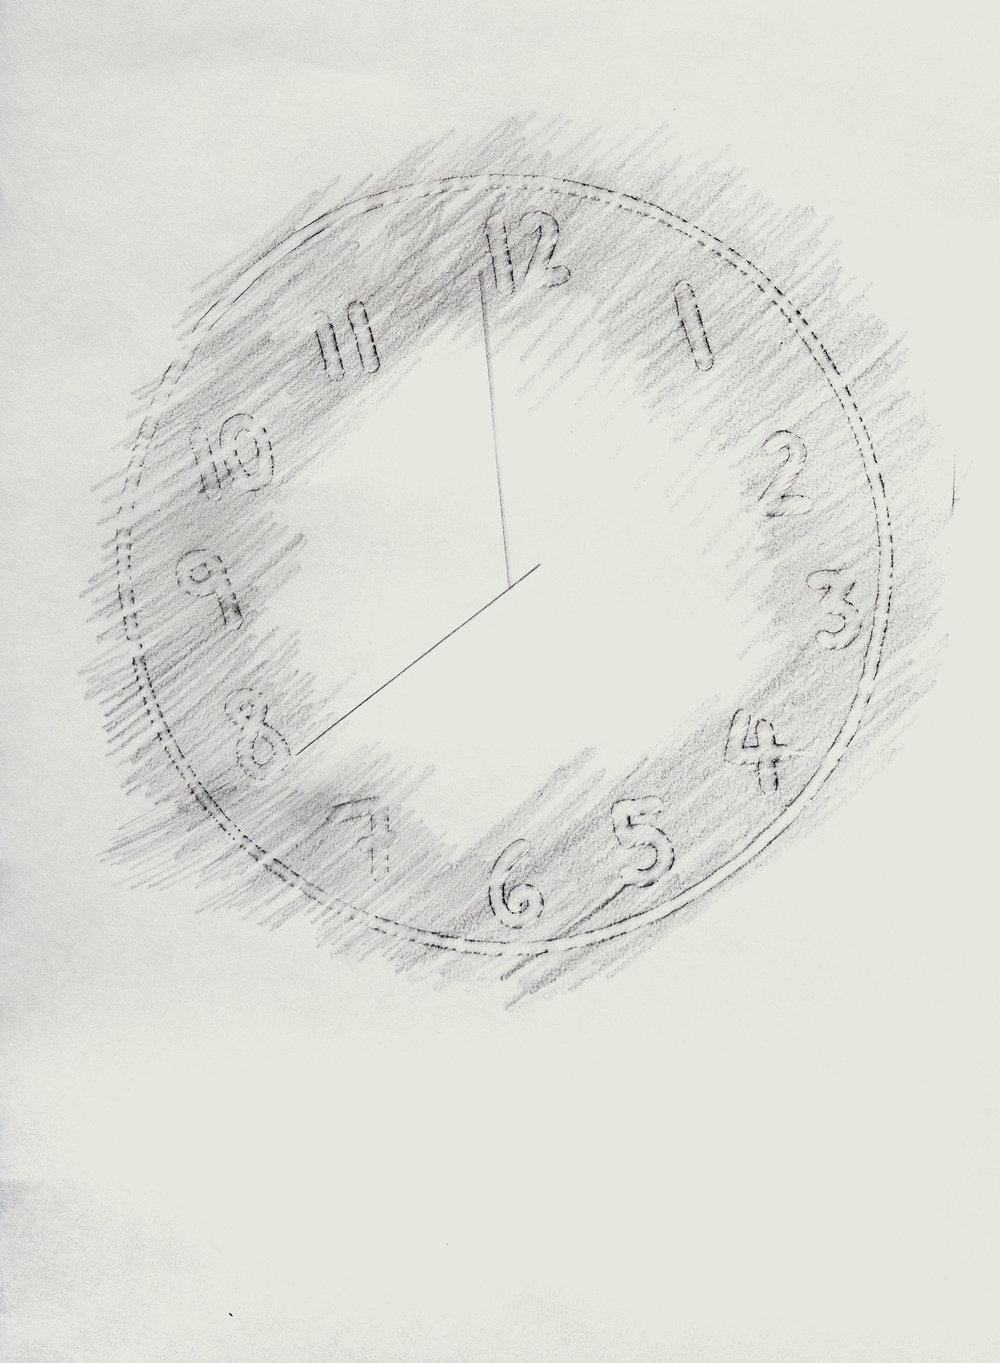 clock_rubbings_0009_Layer 10.jpg